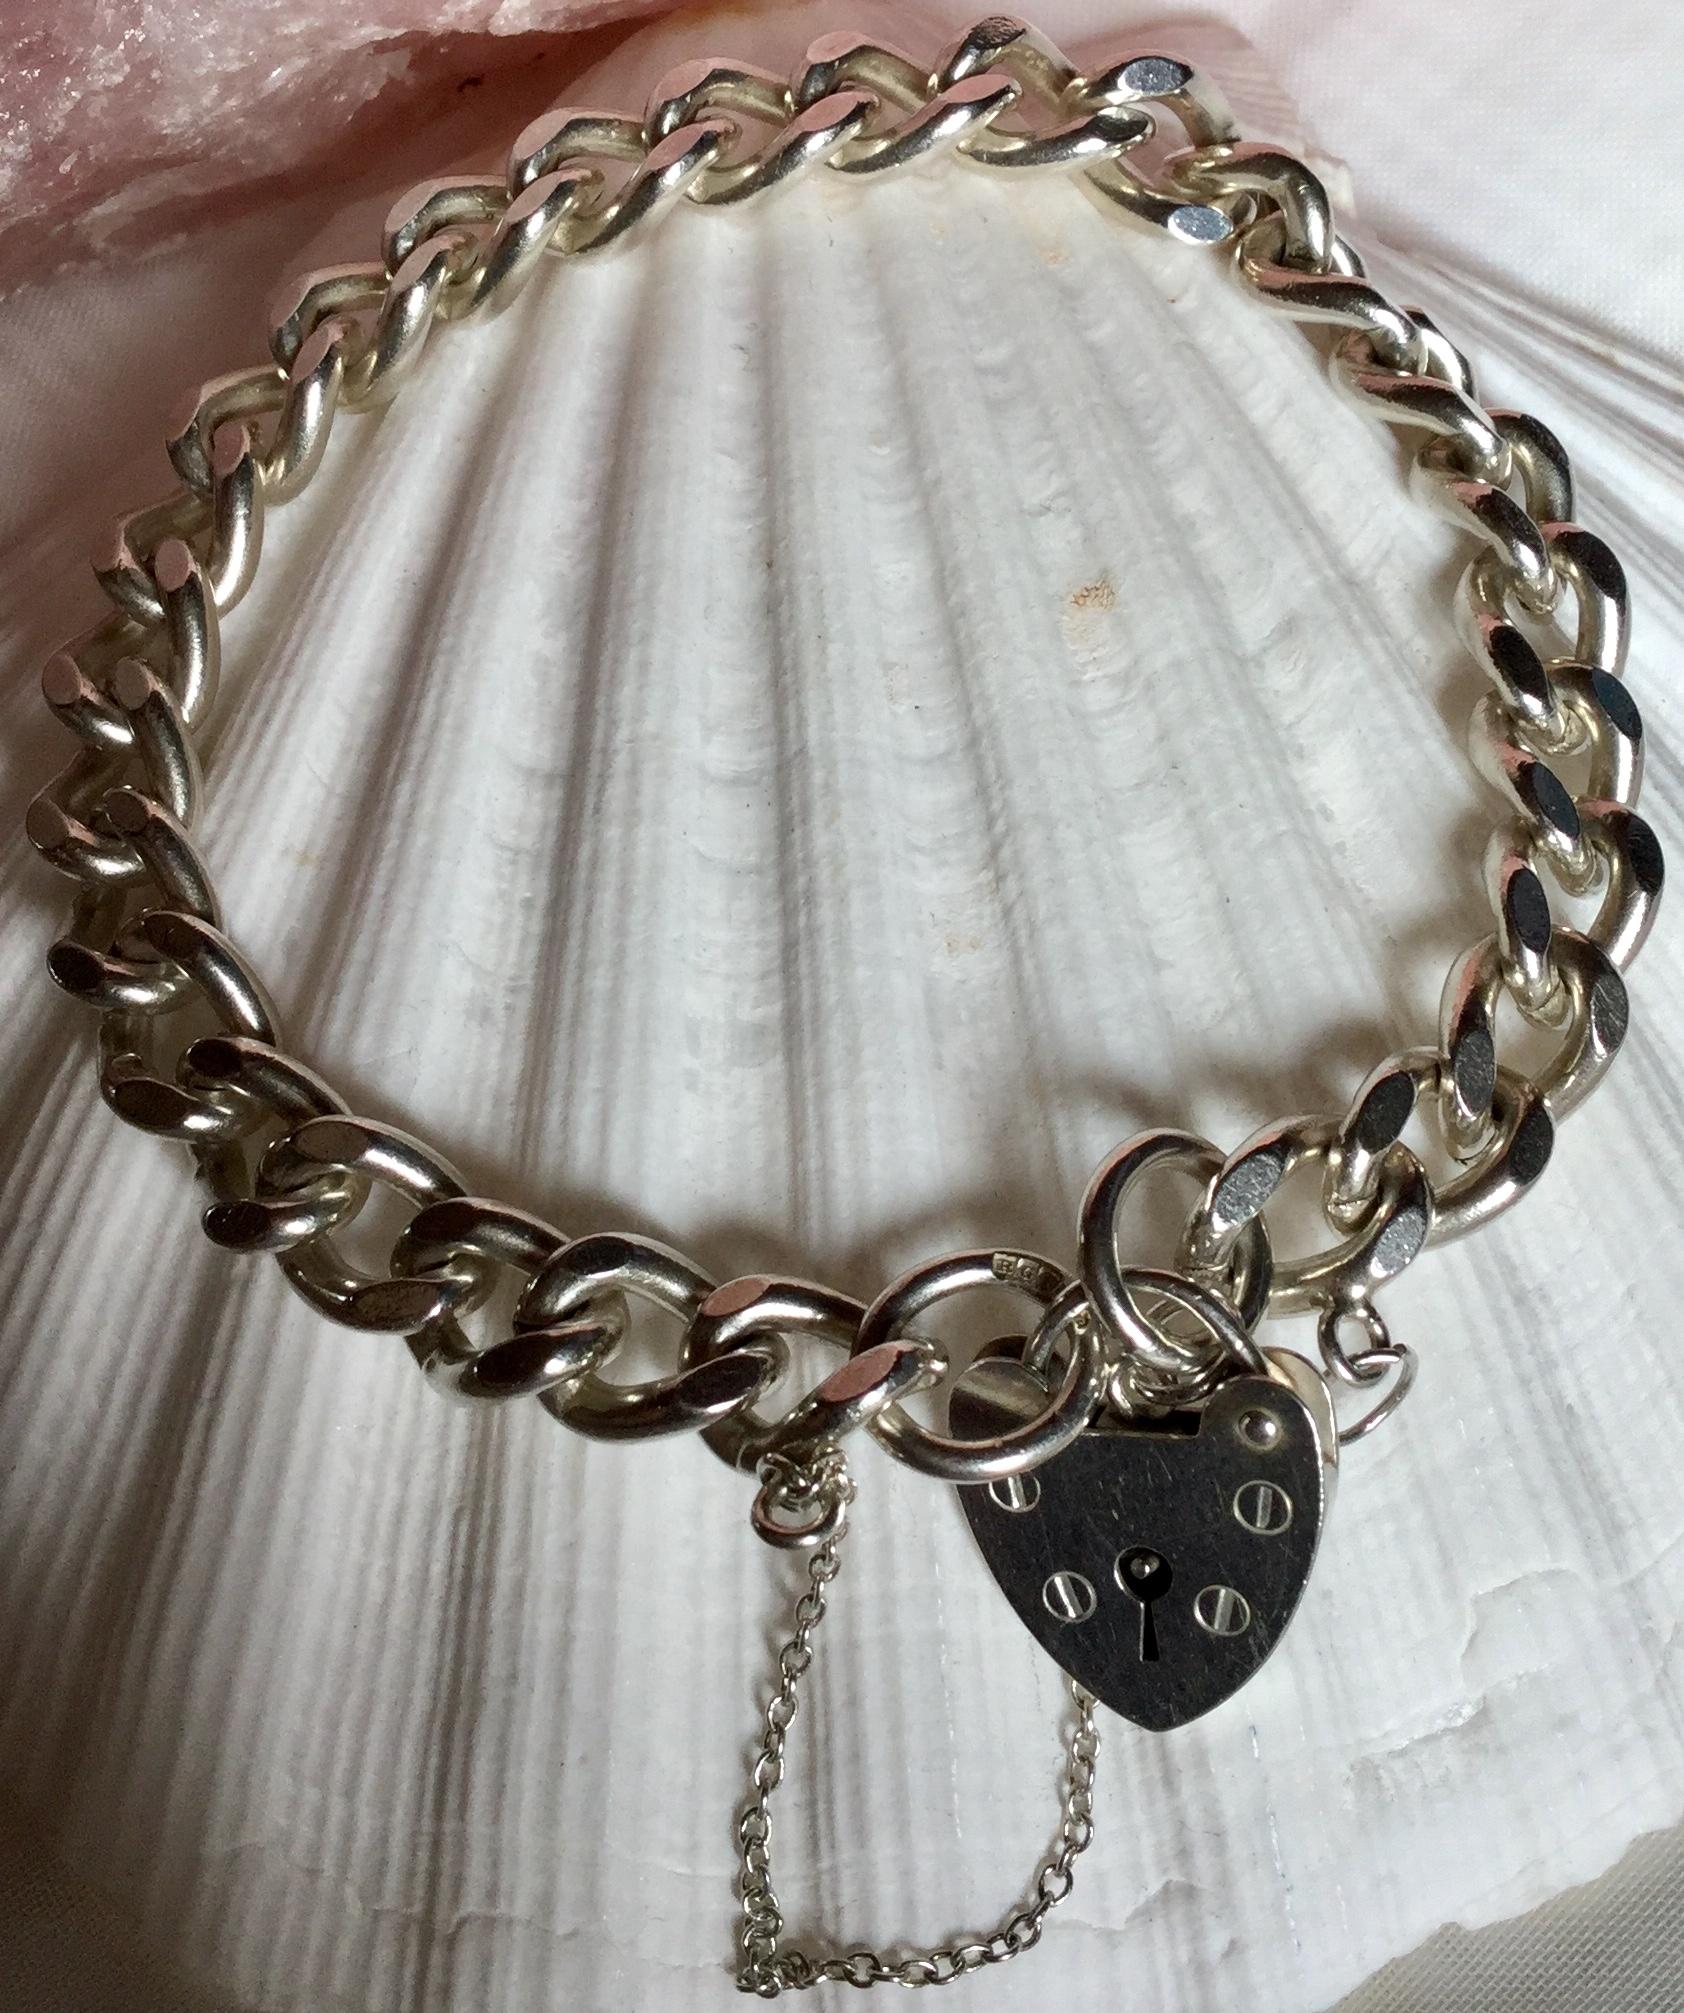 Lot 1 - English Vintage 925 Silver Charm Bracelet Heart Clasp English Hallmarks 30.89 grams